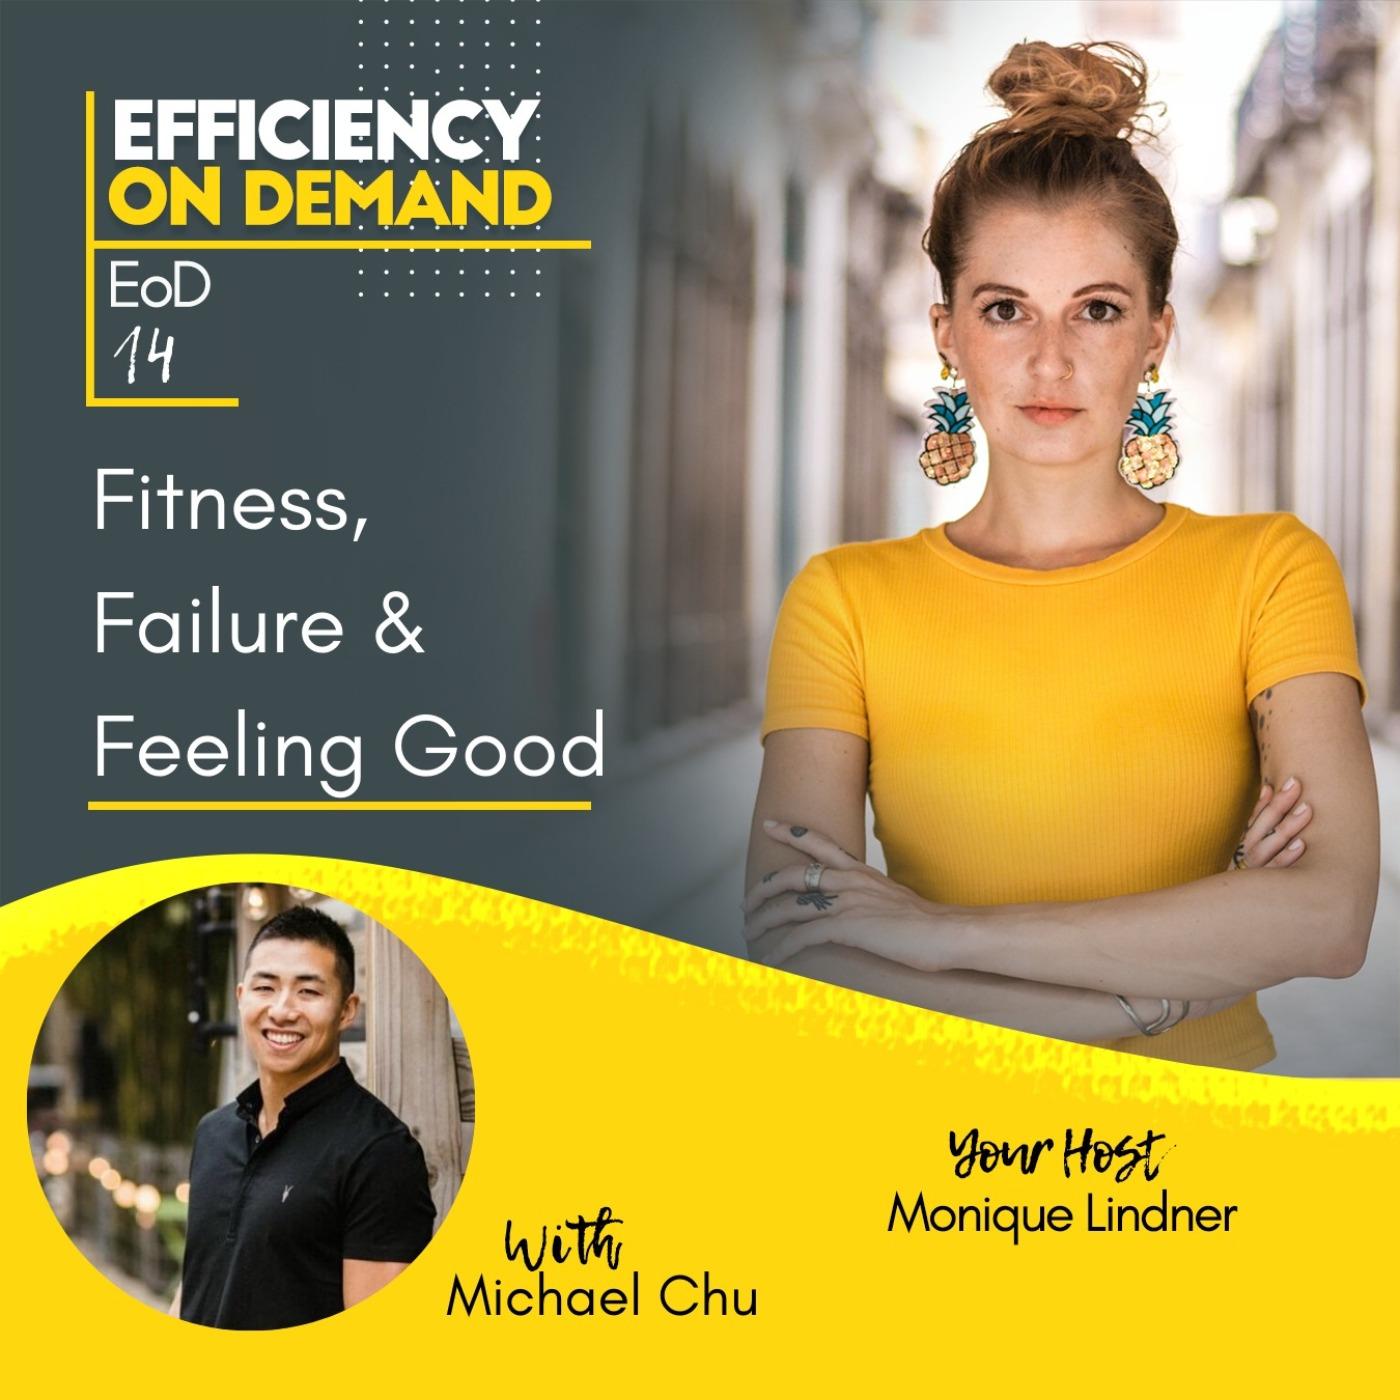 Fitness, Failure & Feeling Good with Michael Chu